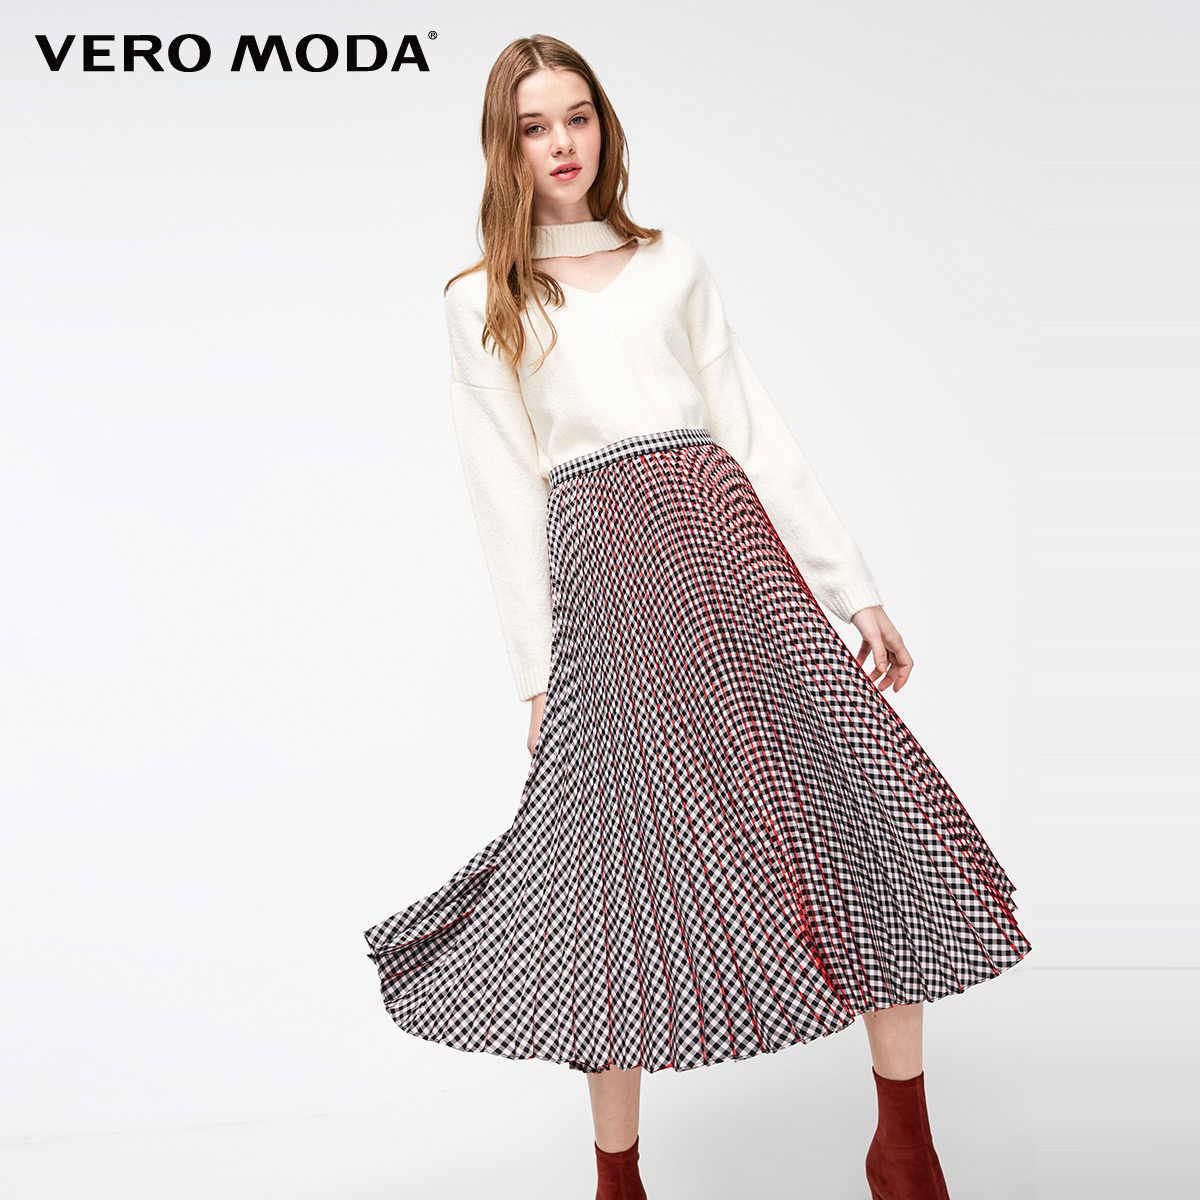 Vero Moda נשים של בציר מנוגדים משובץ קפלים חצאית | 319116508